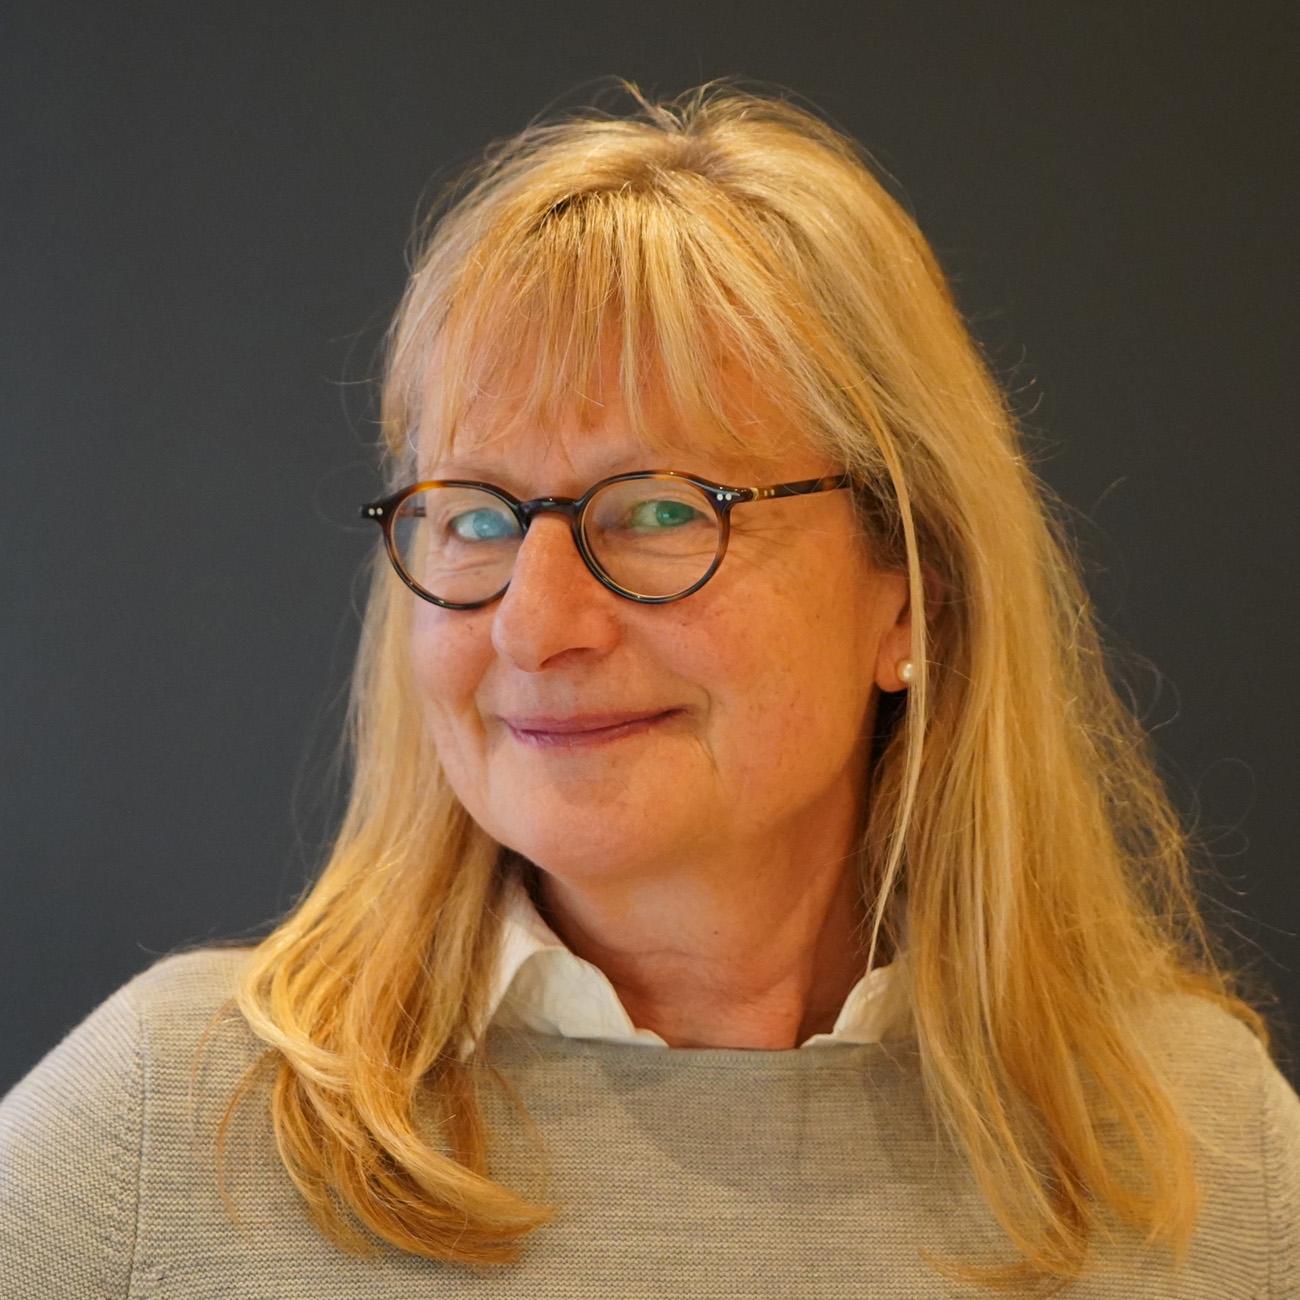 Dr. med. Barbara Bernhart-Martius - Frauenarzt | Gynäkologikum 24 - Praxis für Gynäkologie München | Zentrum